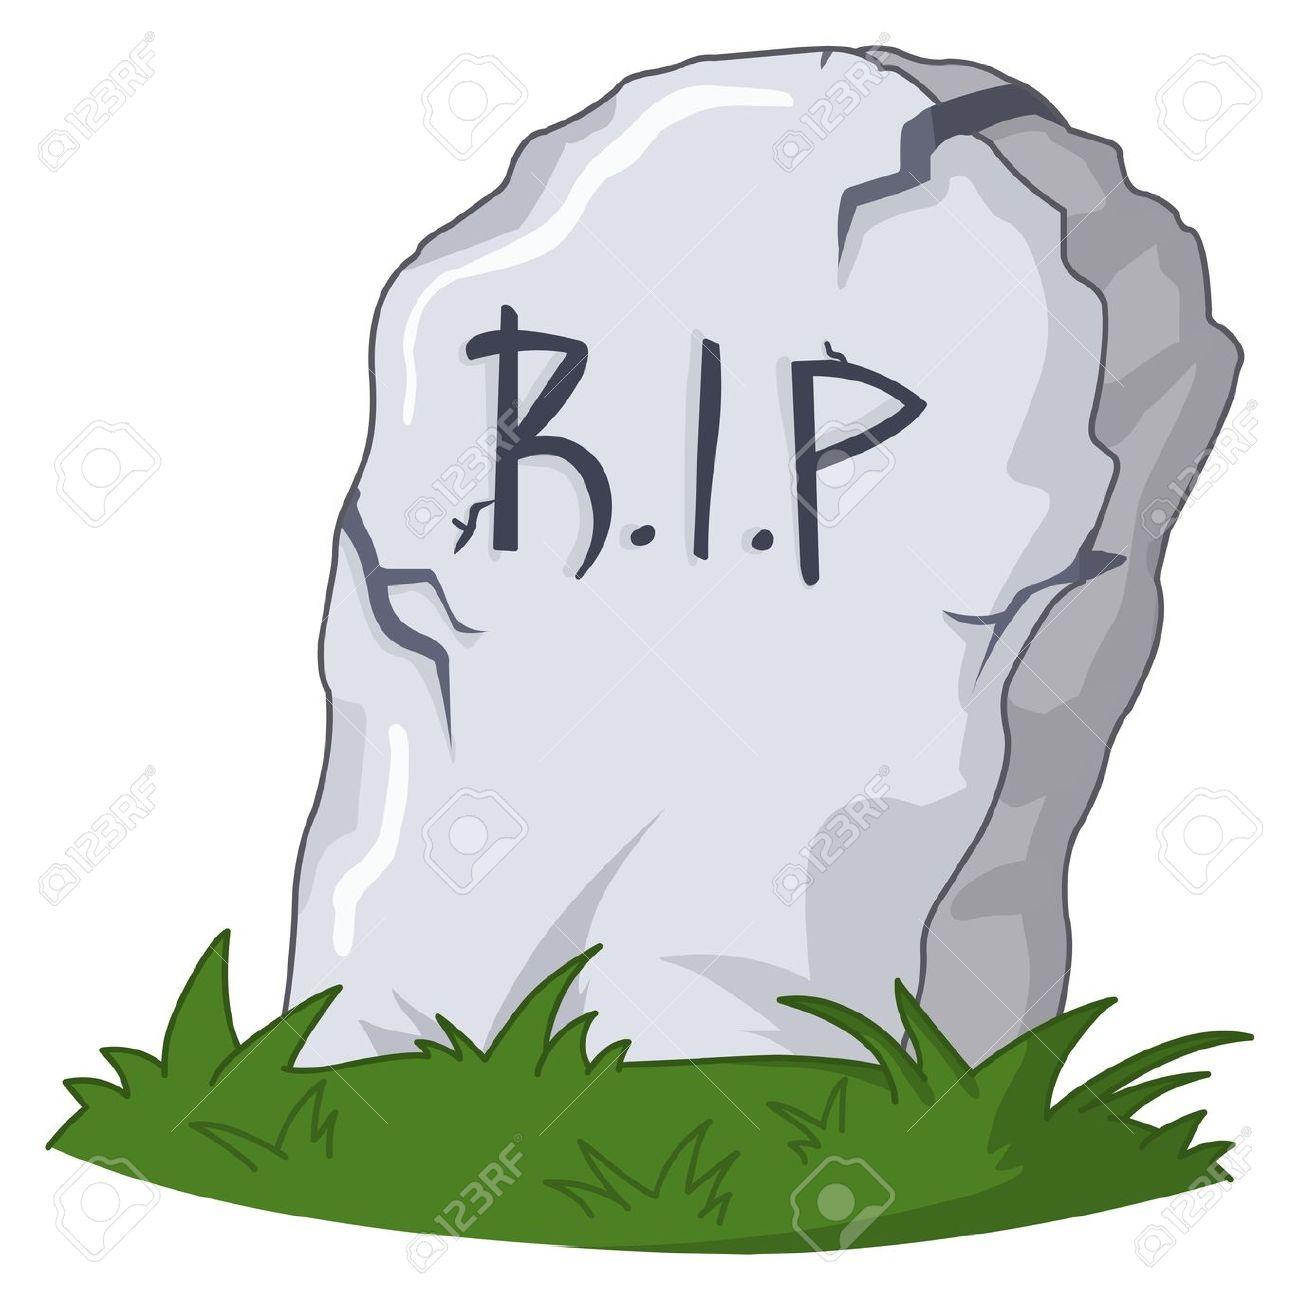 Rip grave clipart.